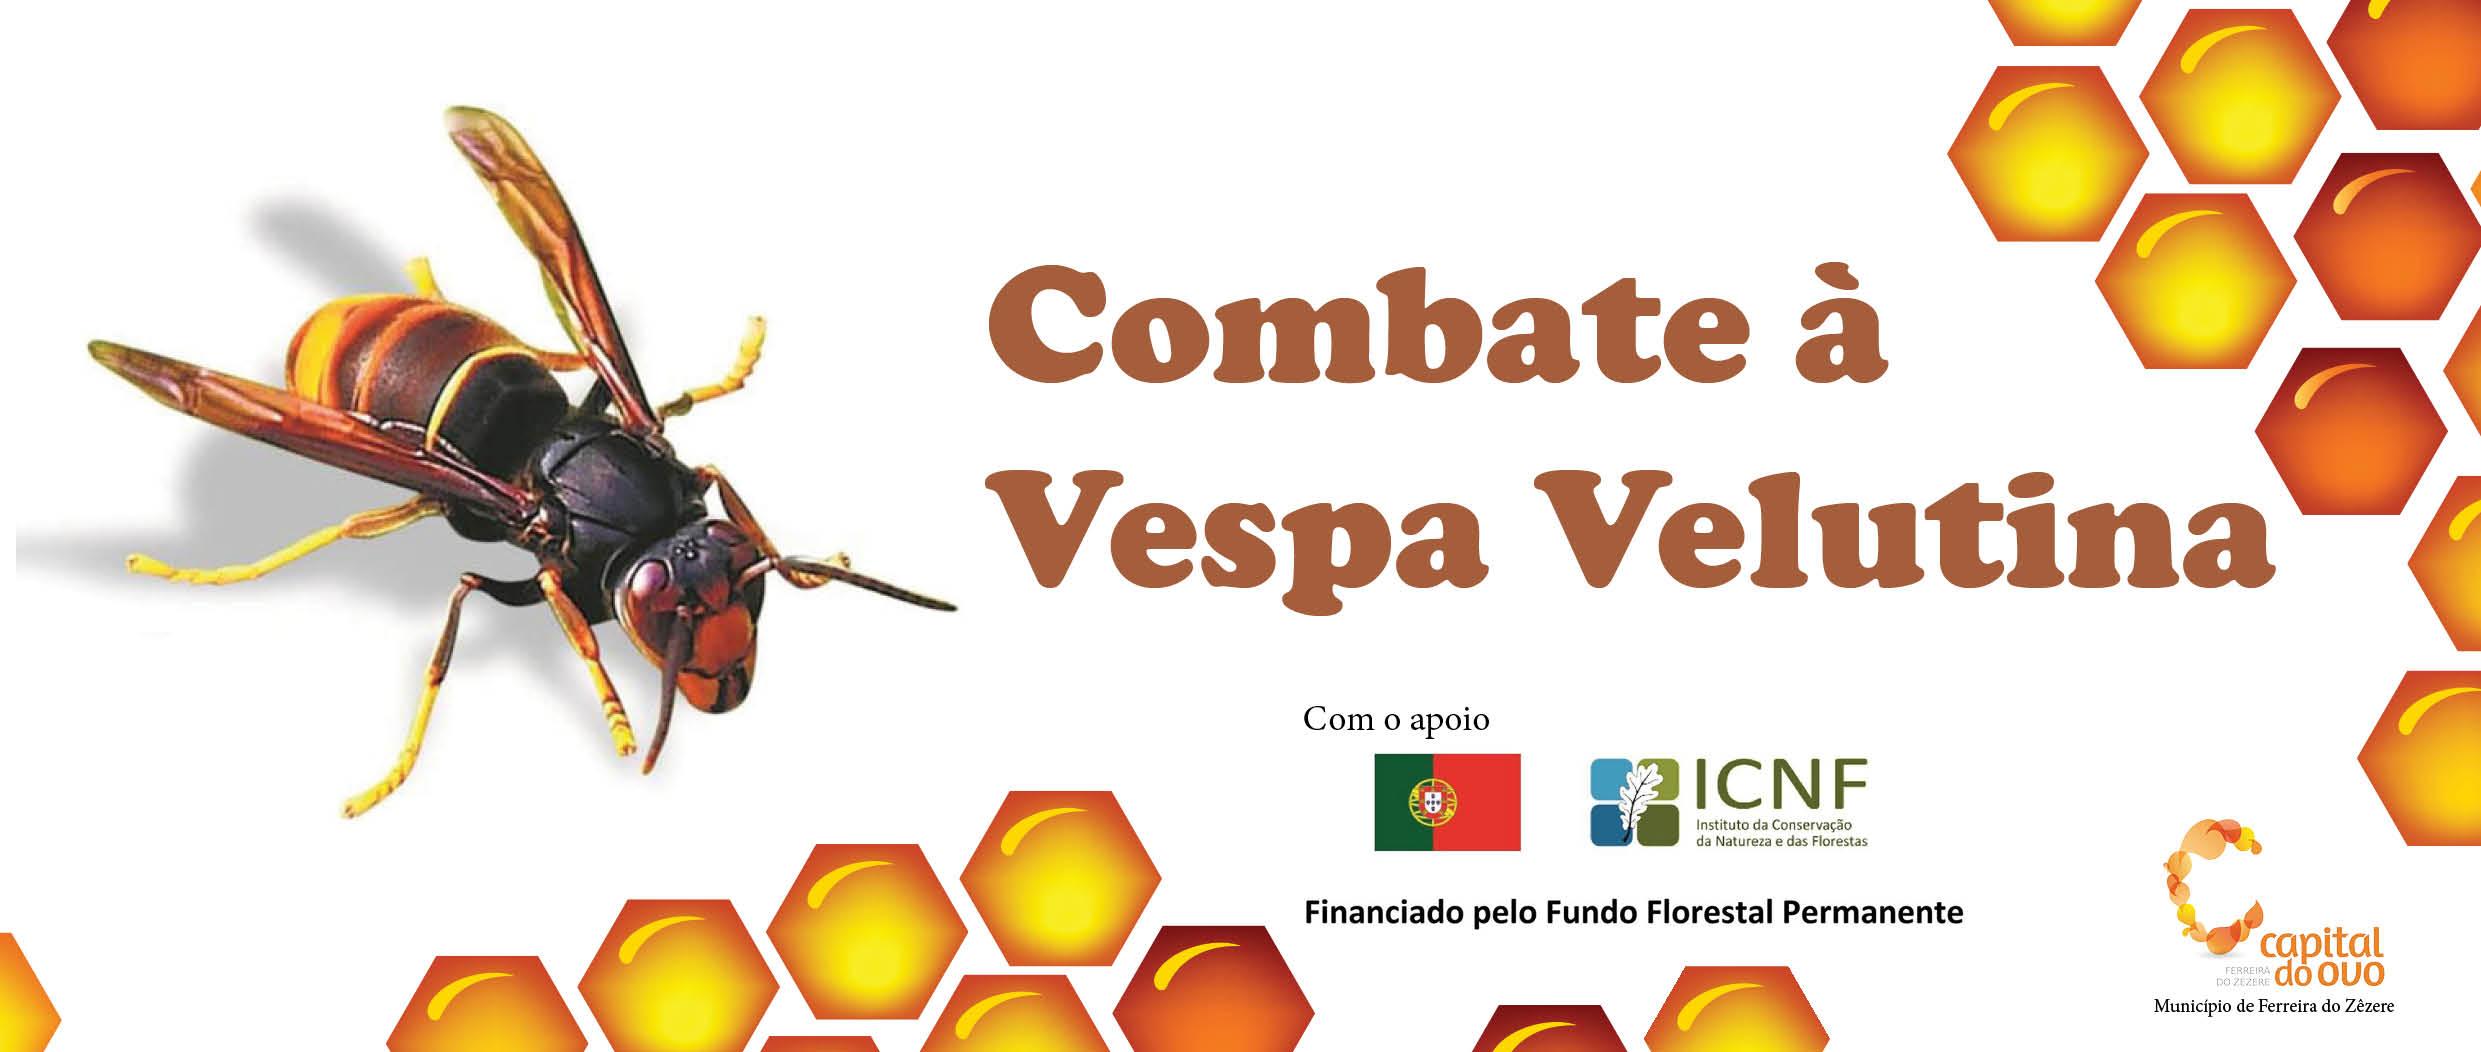 Combate à Vespa Velutina